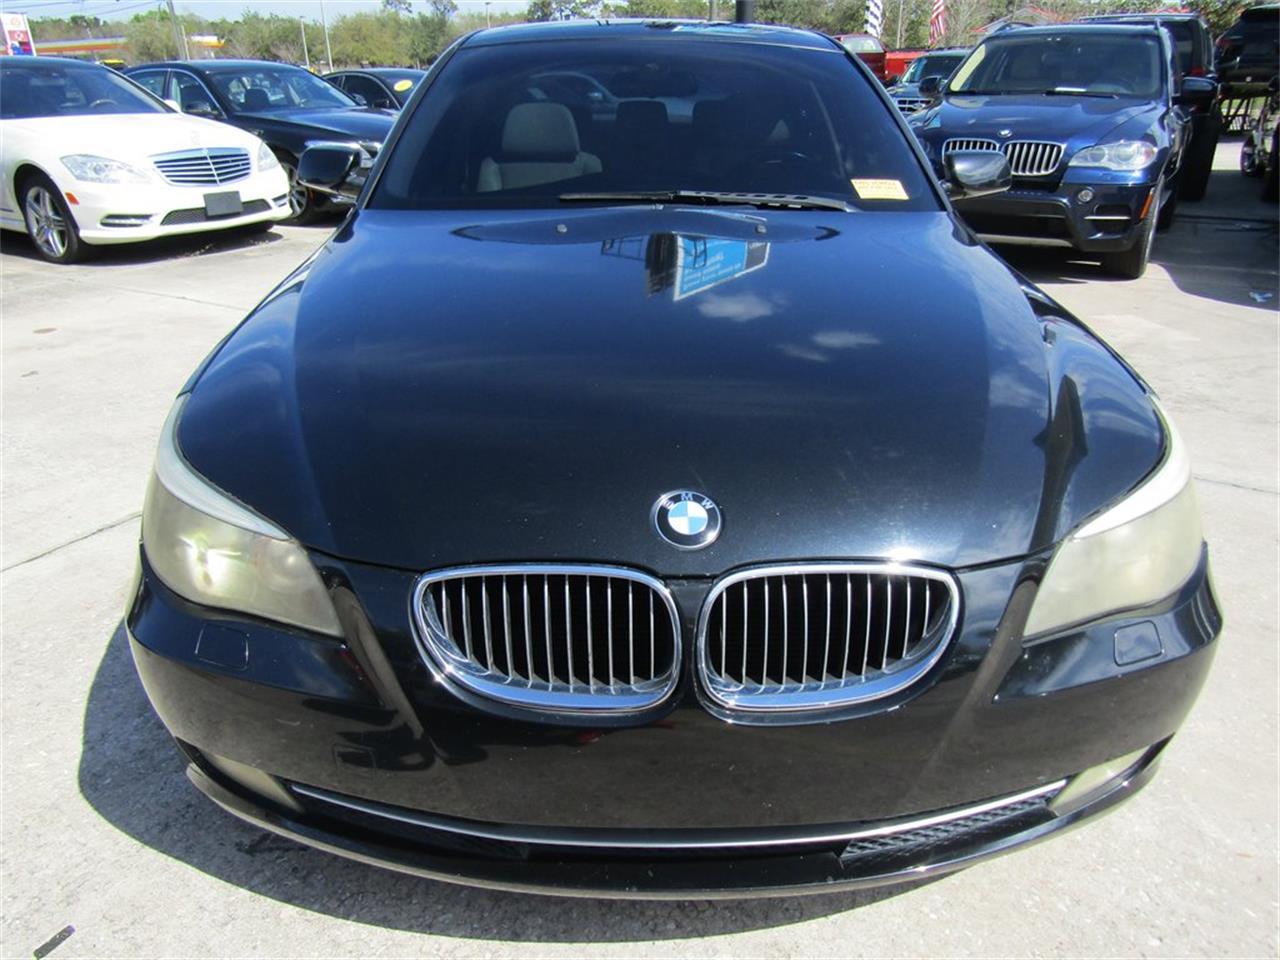 2010 BMW 5 Series (CC-1215971) for sale in Orlando, Florida